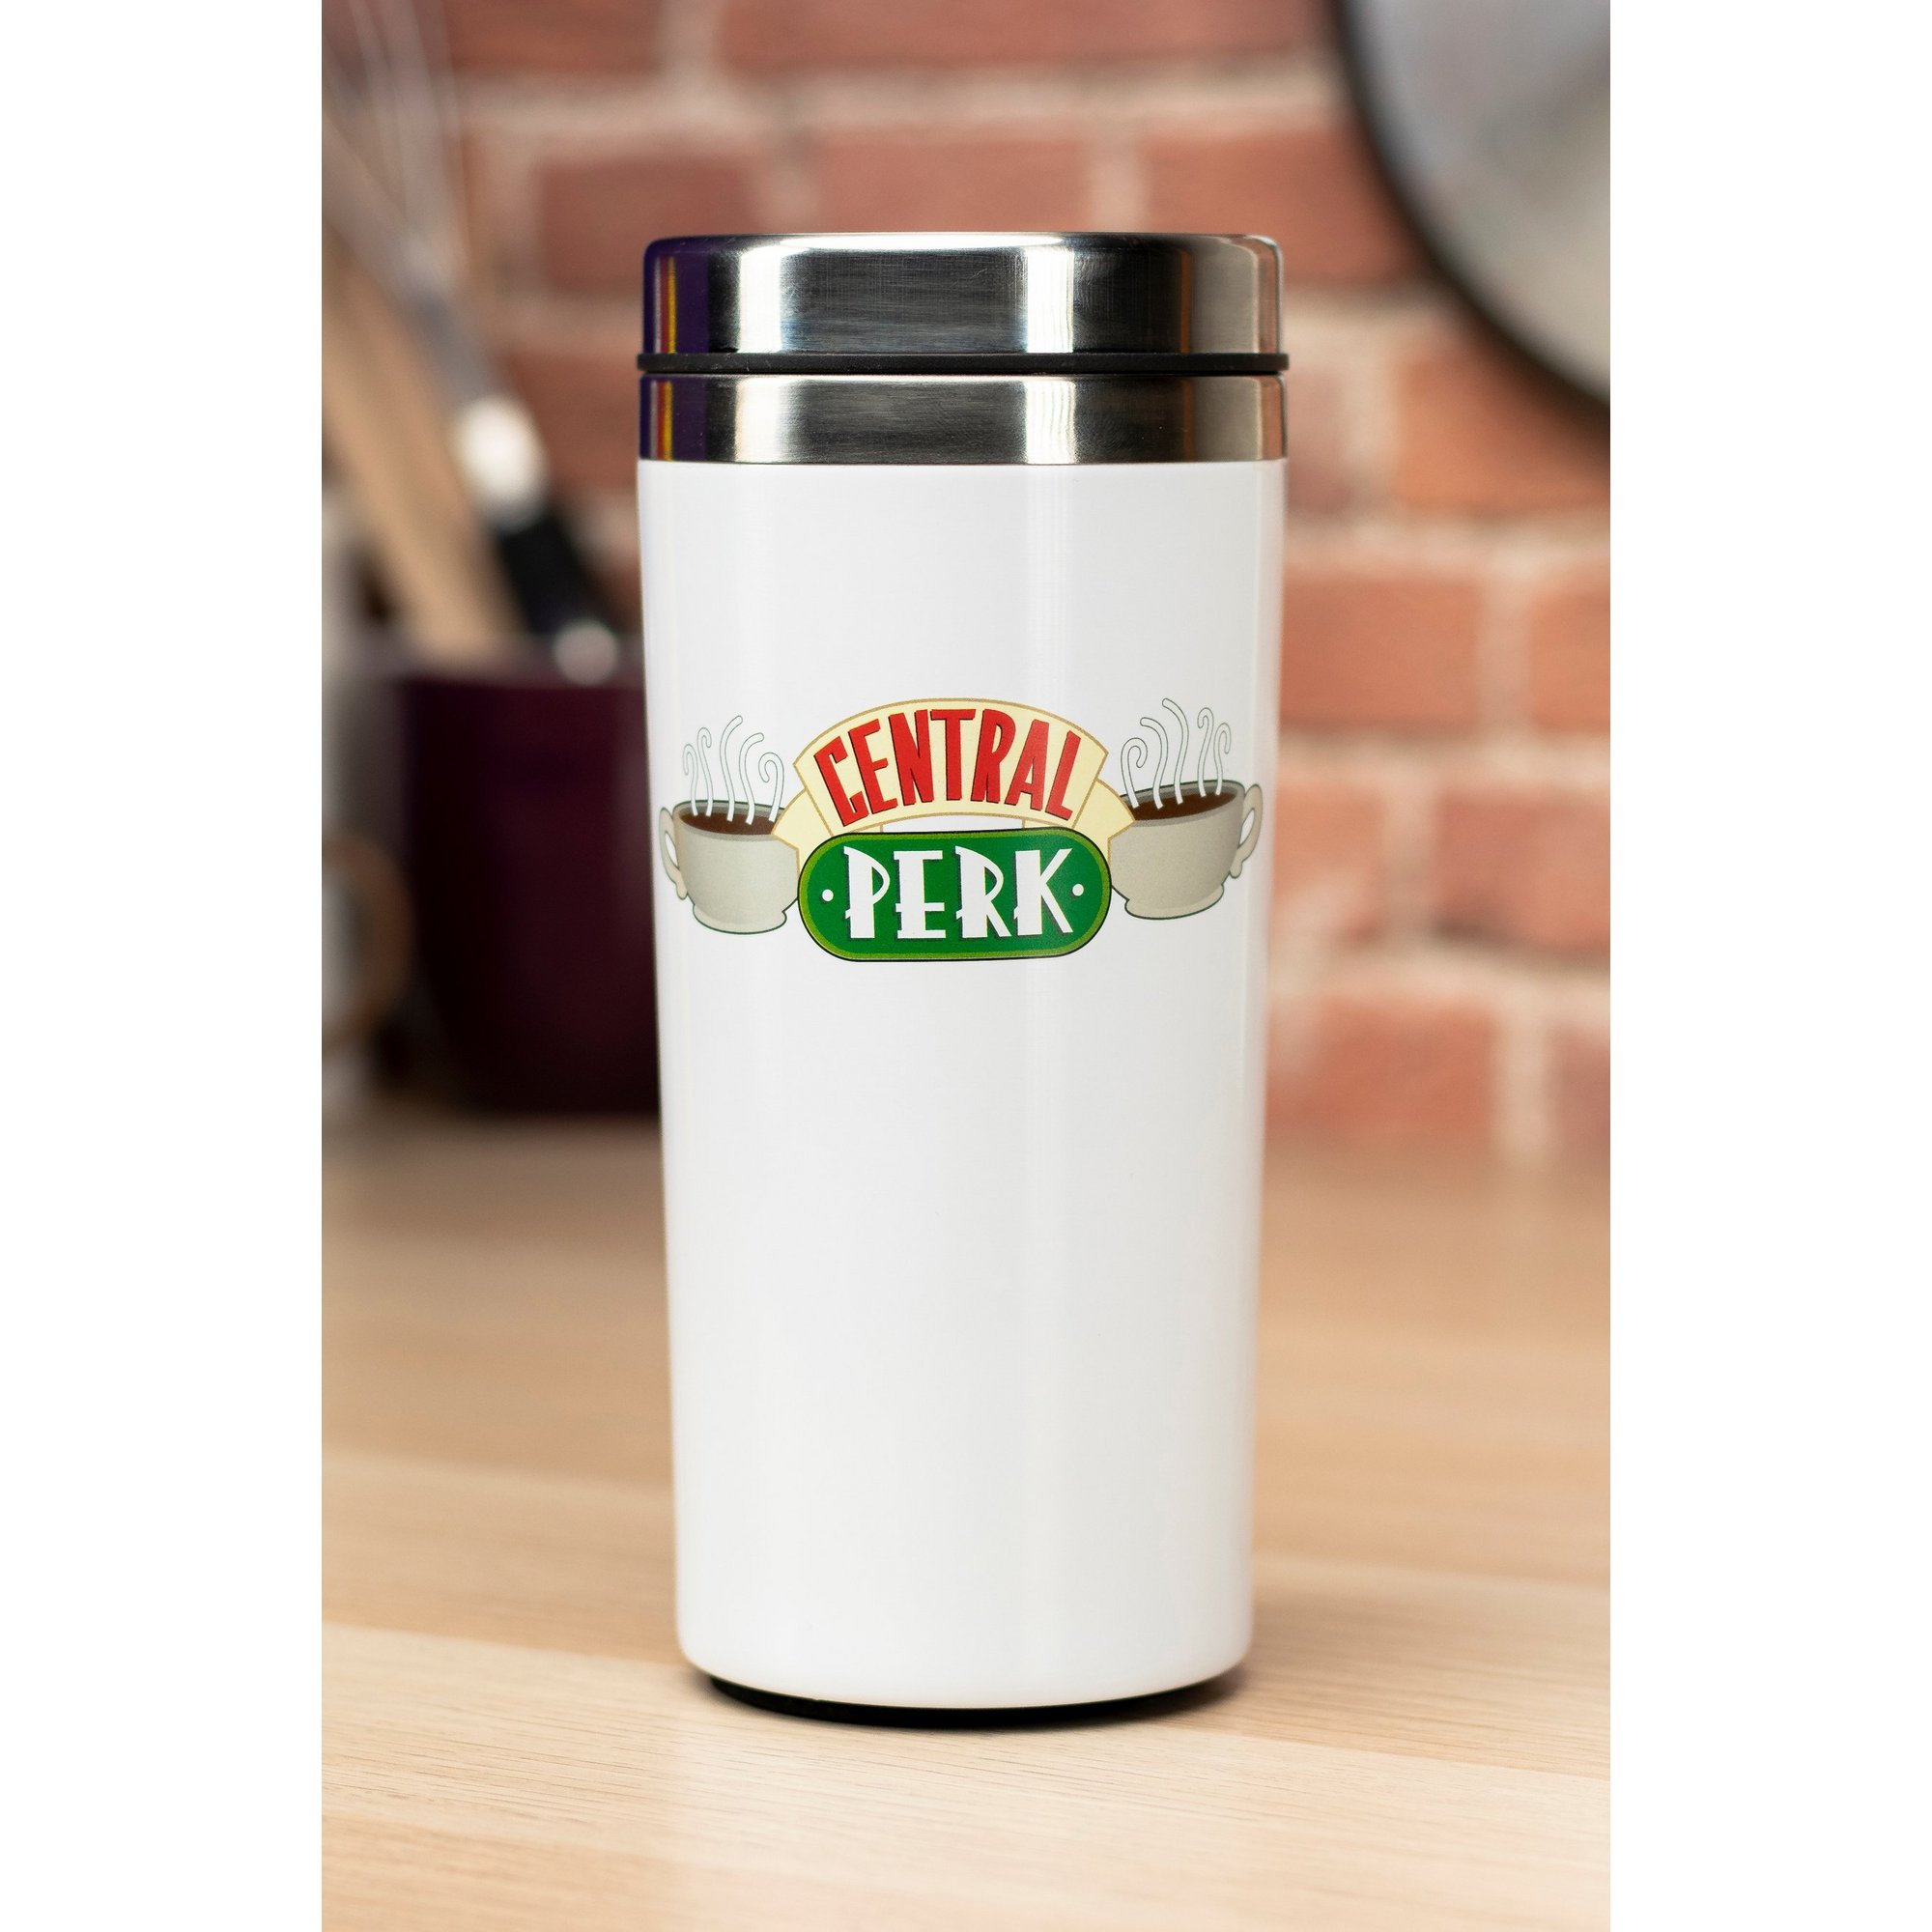 Image of Central Perk Travel Mug